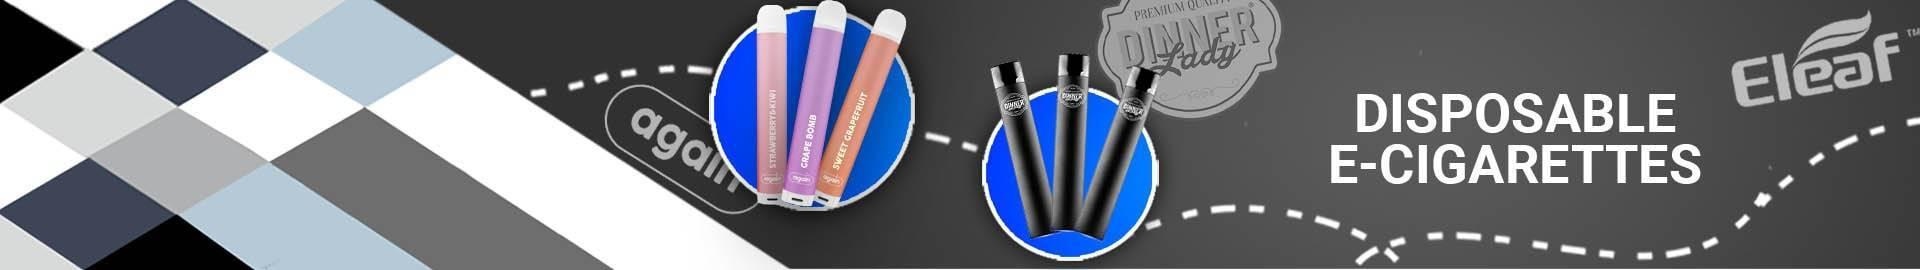 Disposable E-cigarettes   Royalsmoke